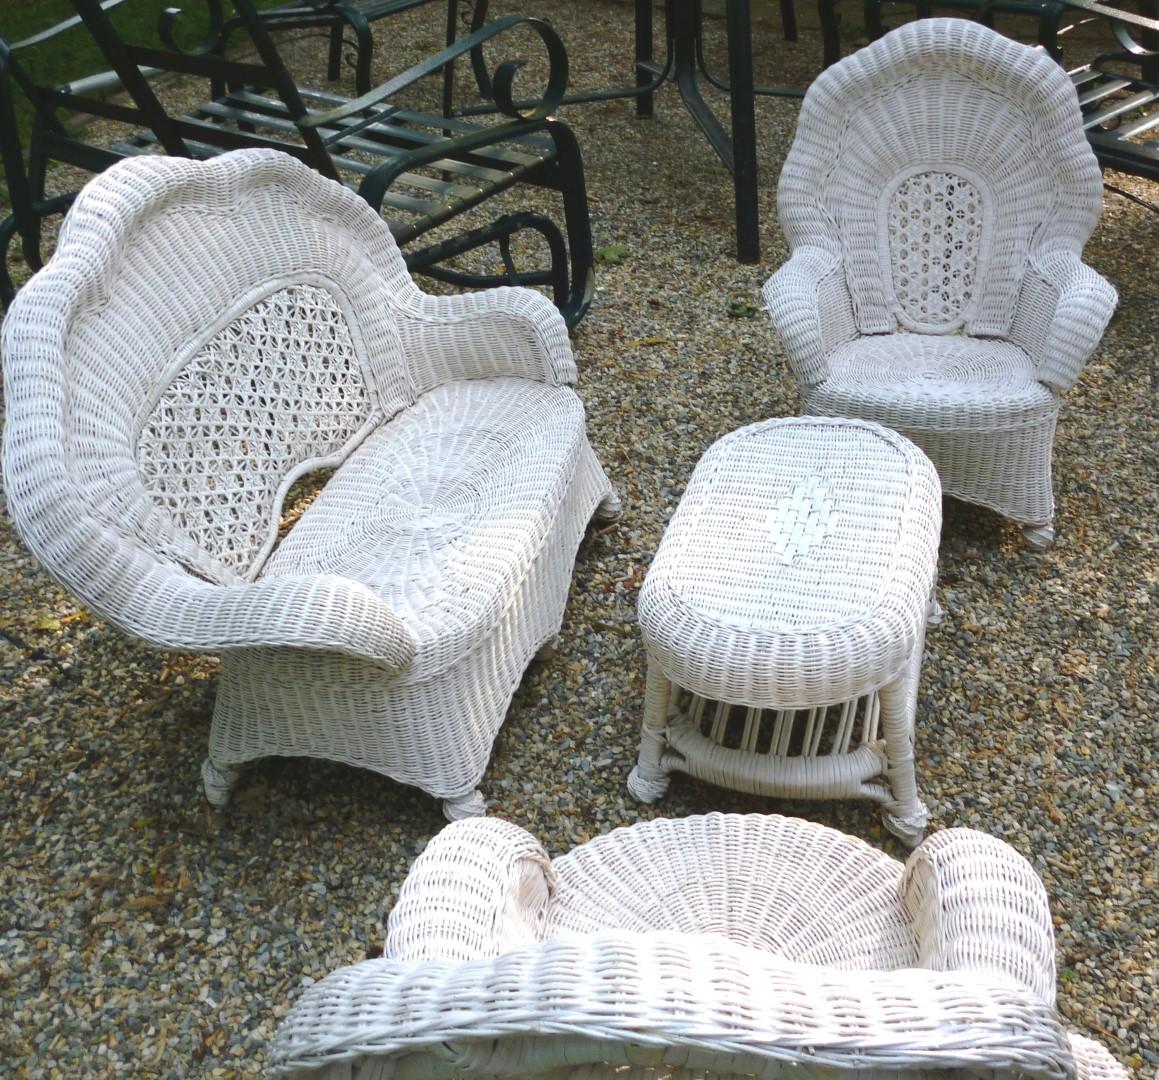 Outdoor Wicker Furniture For Children